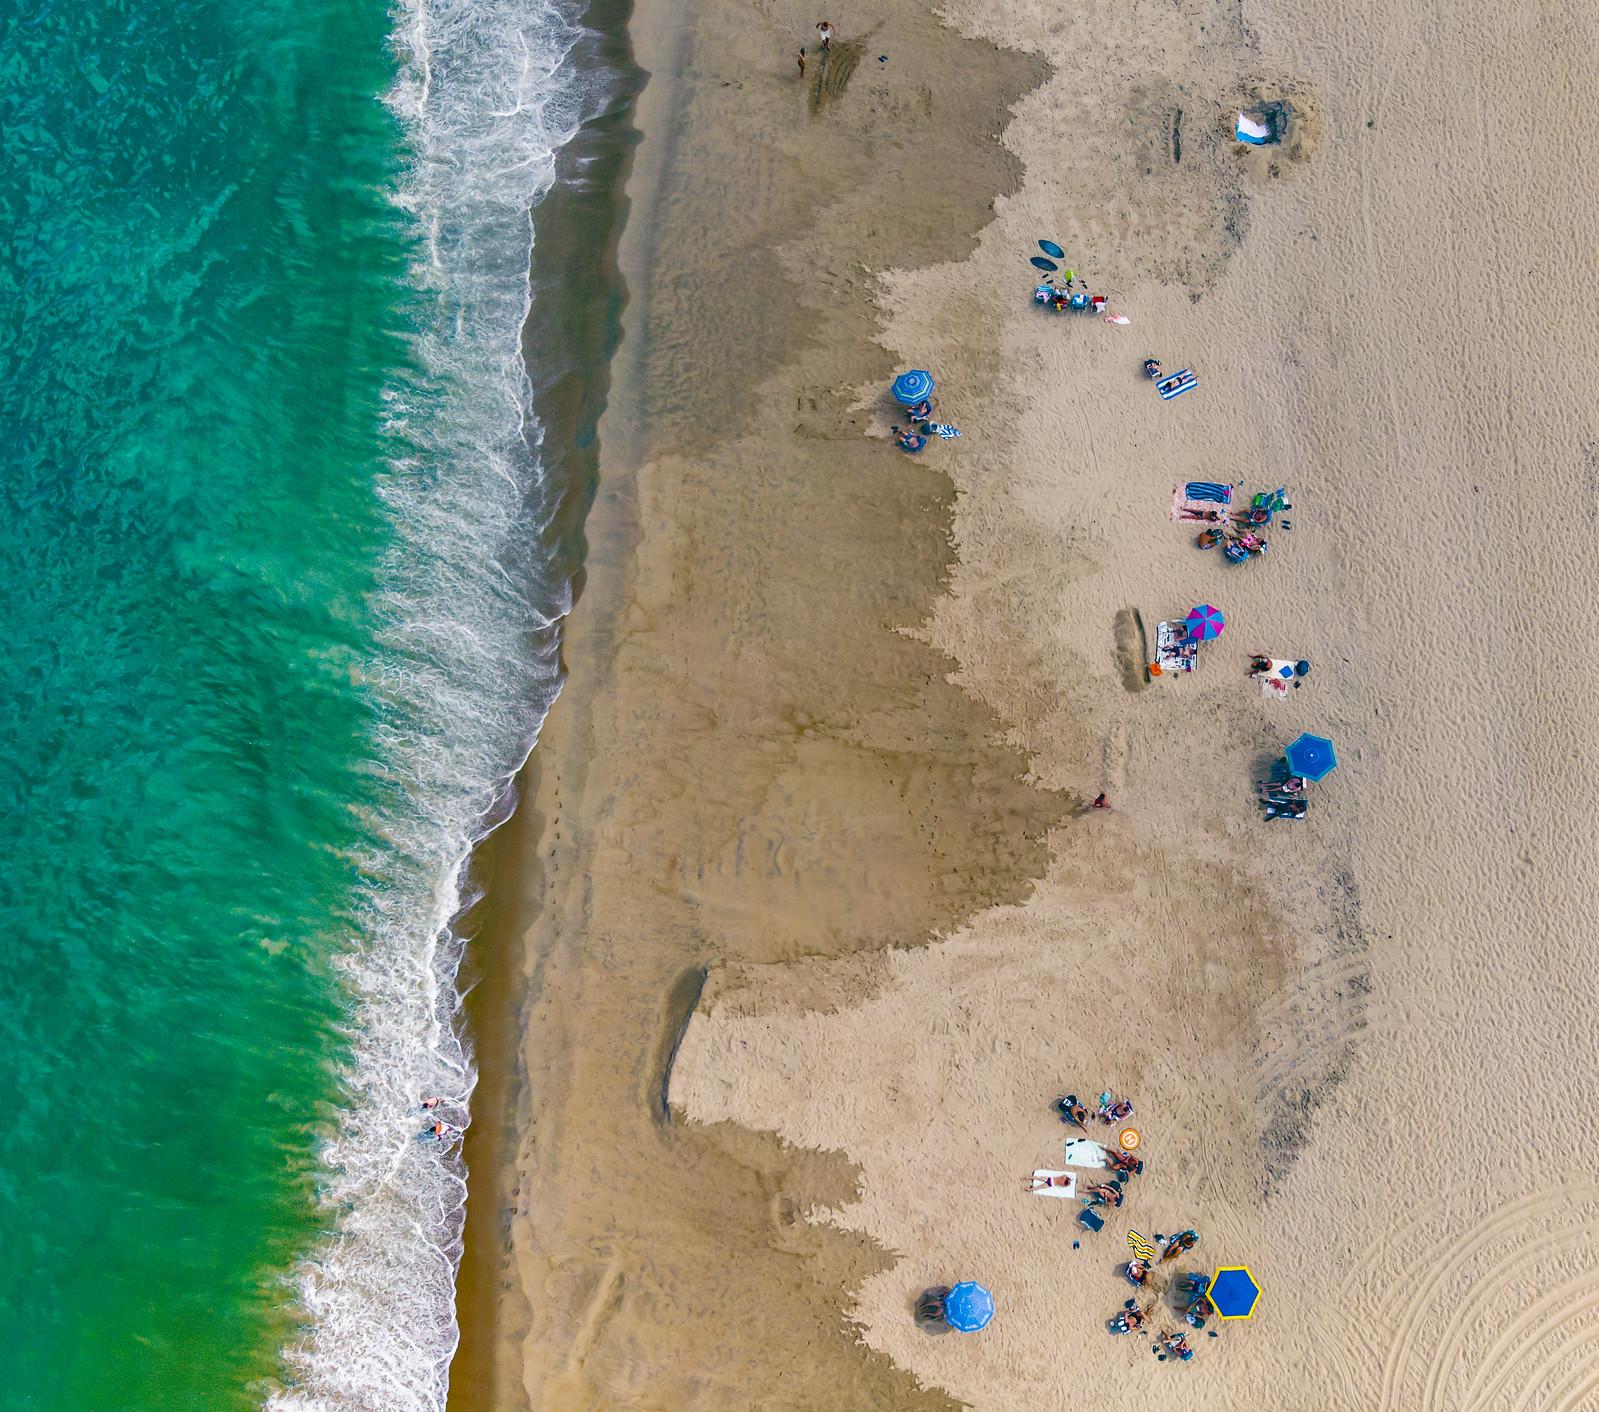 2019.08.10 Rehoboth Beach by Drone, Rehoboth Beach DE, USA 221 22221-Edit-2